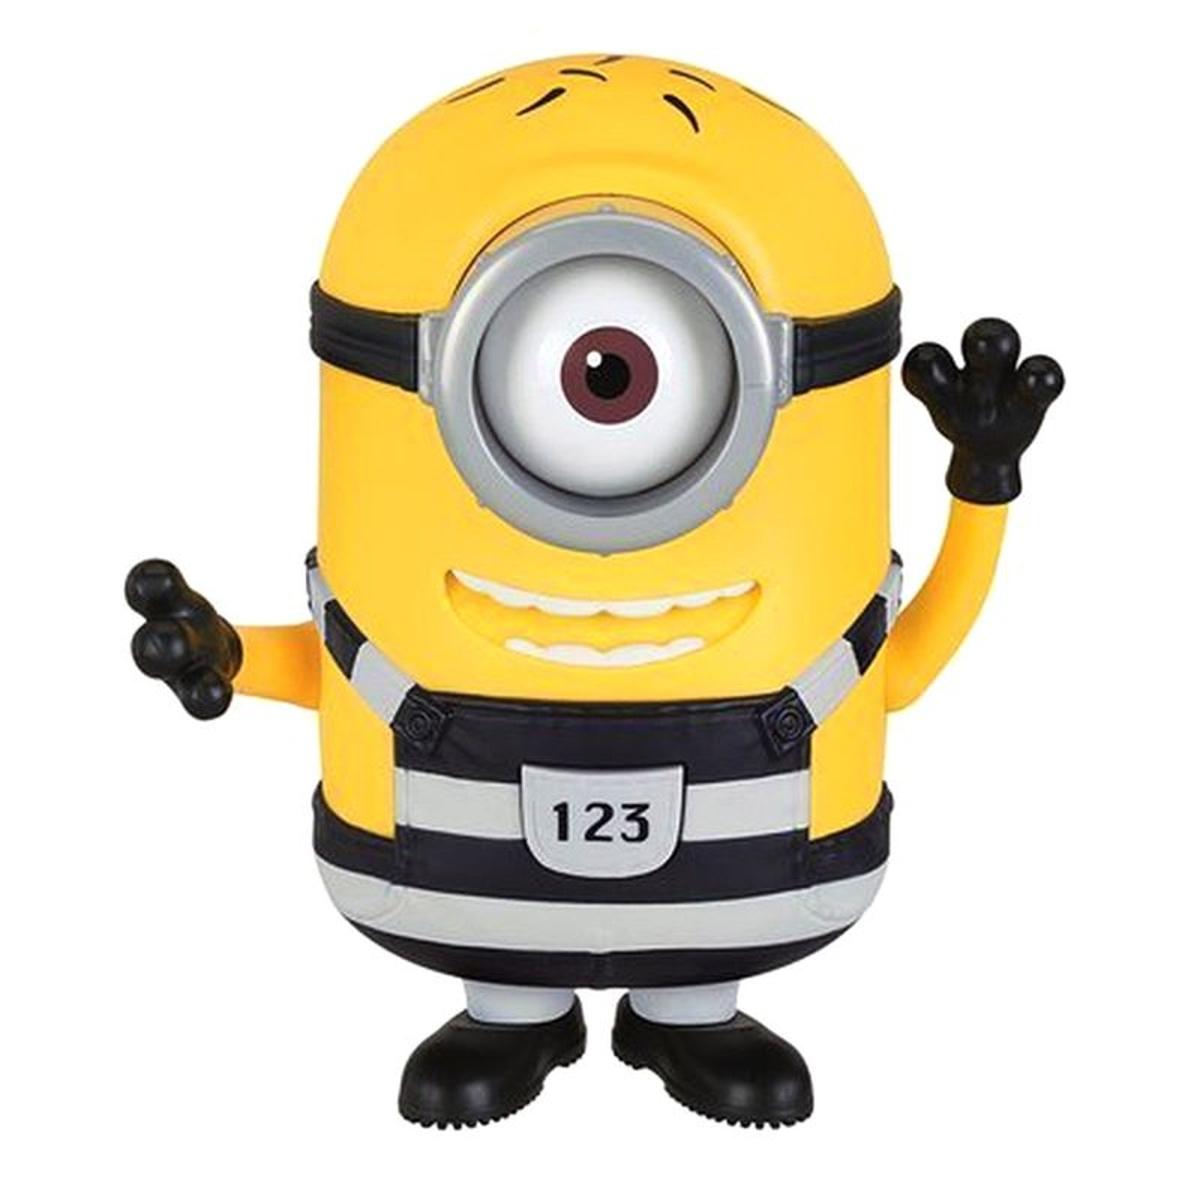 Figurine géante parlante Minions : Carl (à l'assortiment)